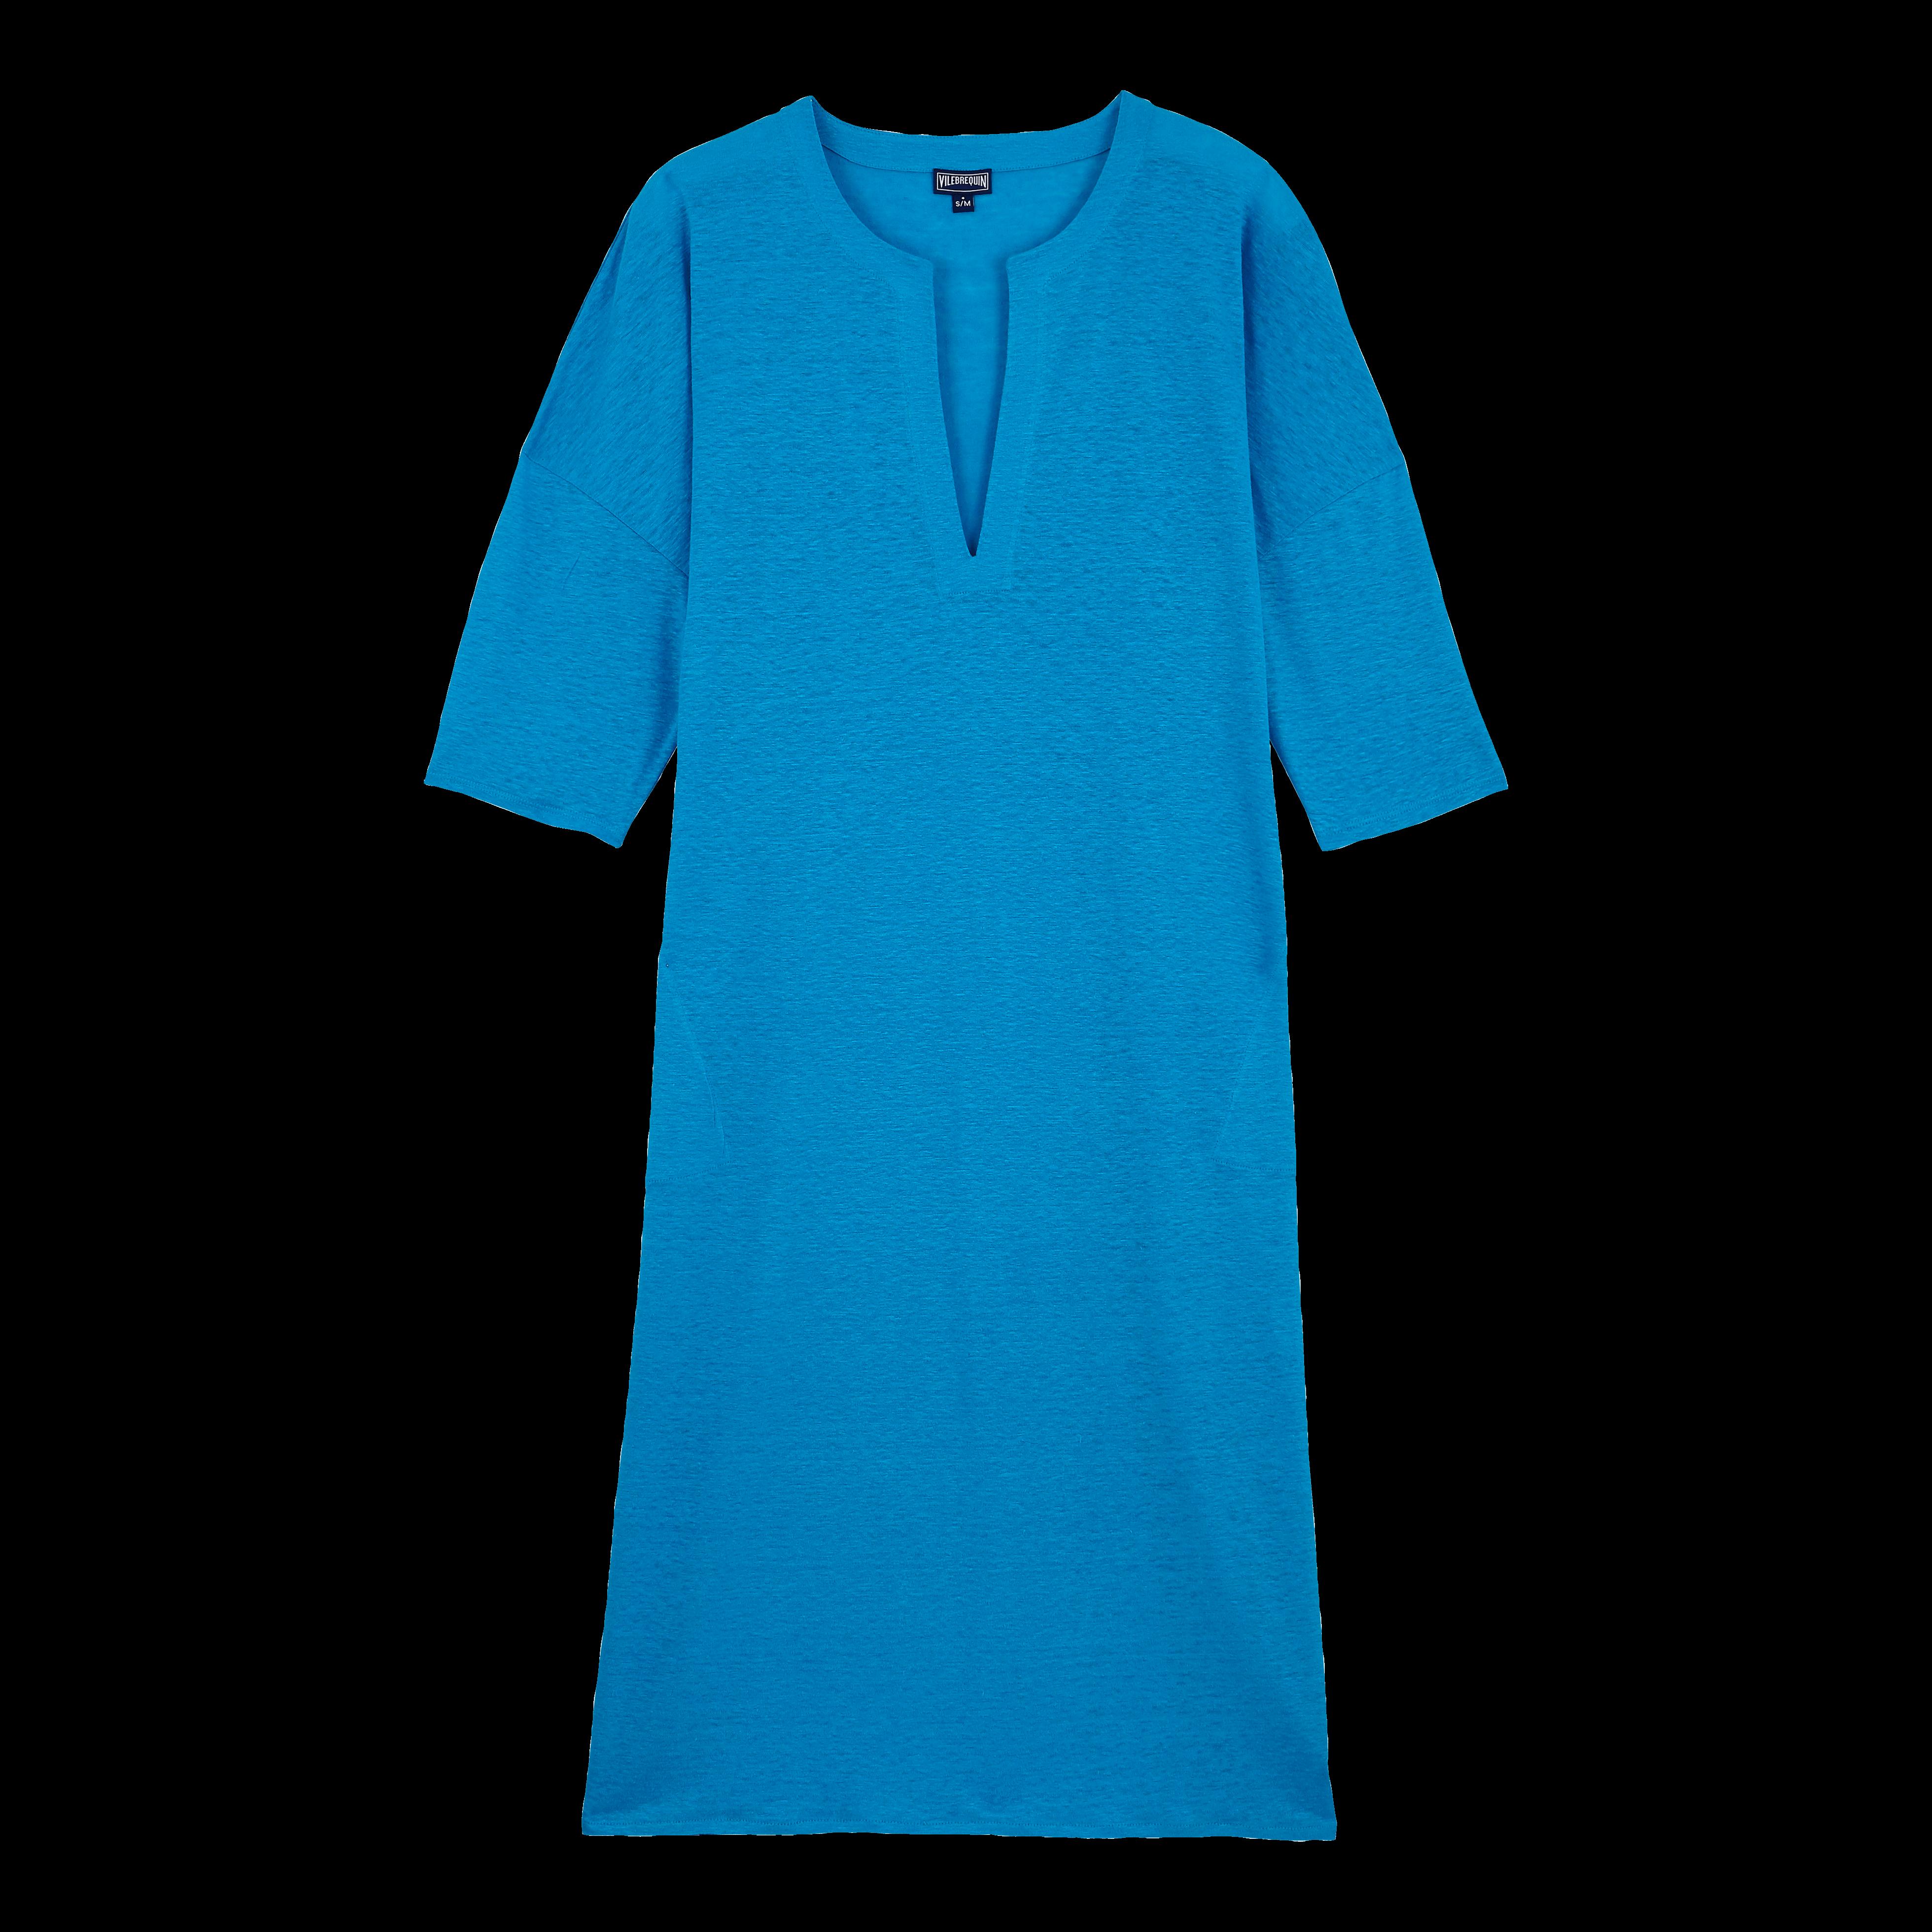 Vilebrequin Women Linen Beach Cover-up Solid In Blue